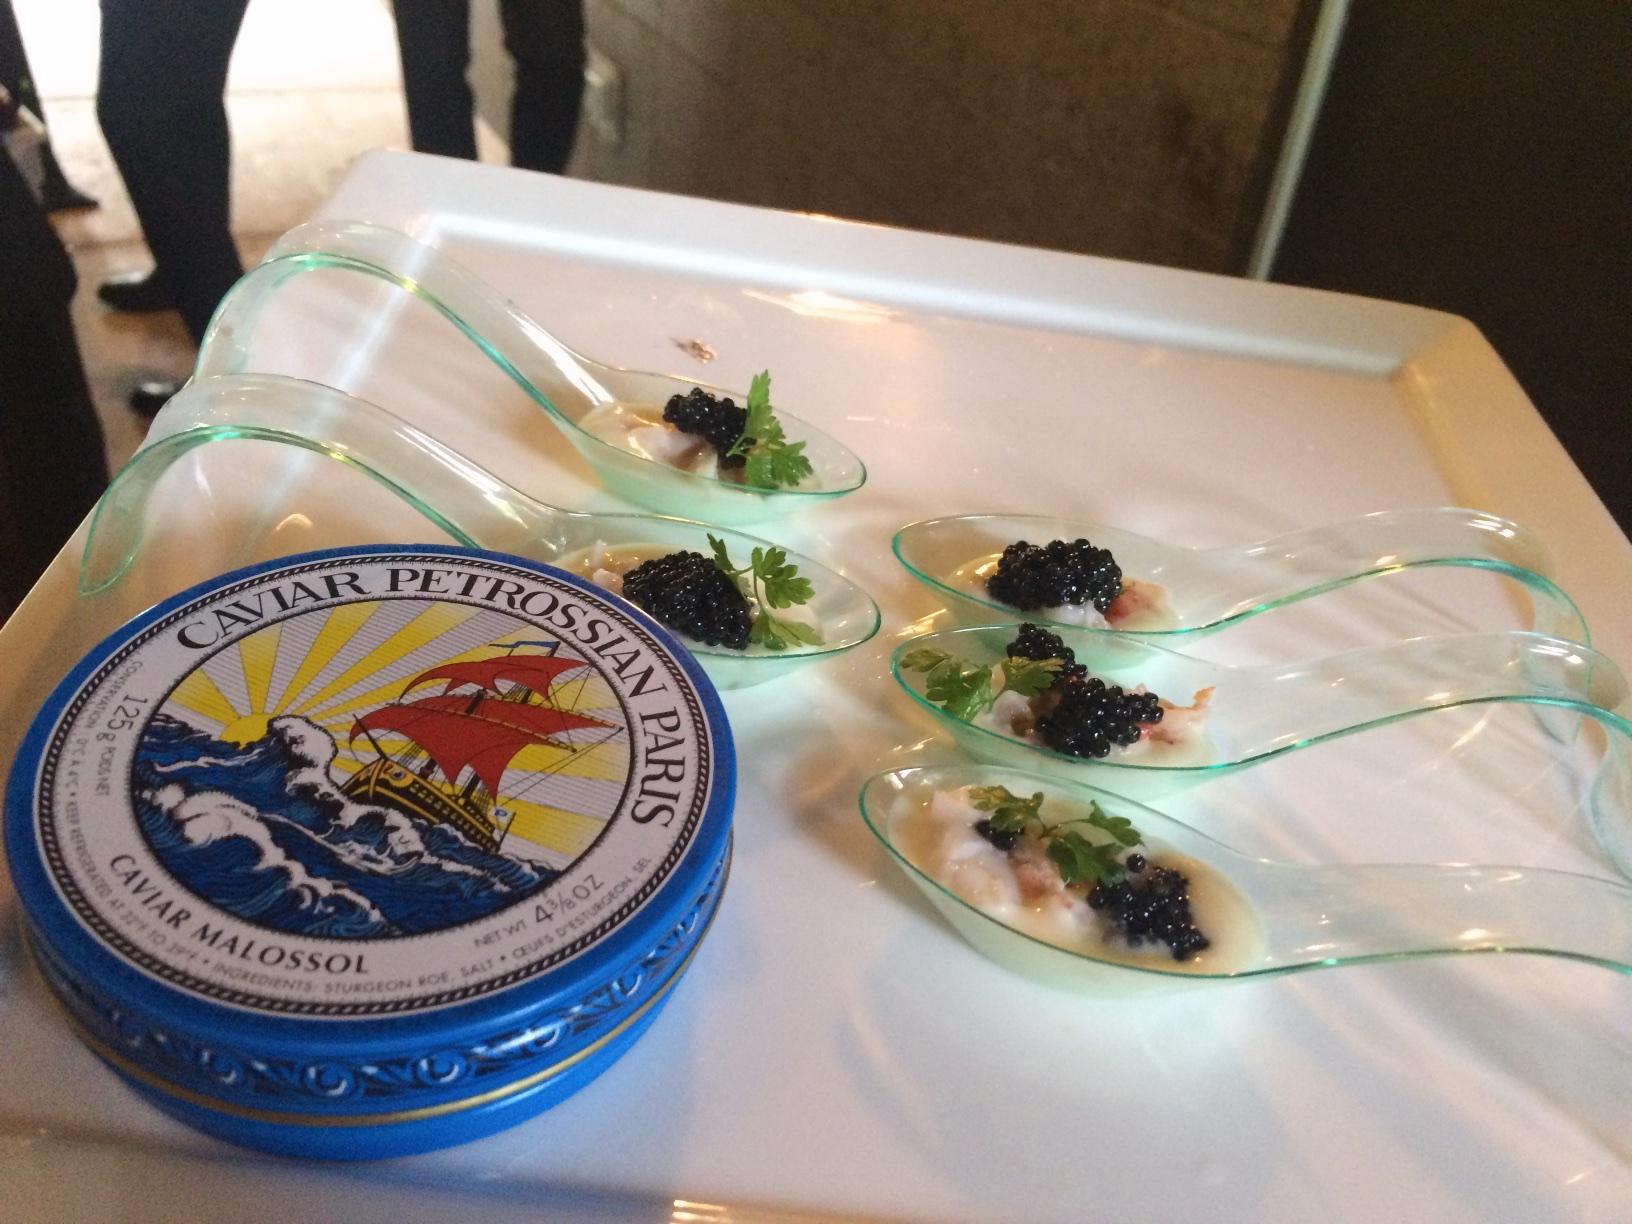 Petrossian Caviar, Maine Lobster, Cauliflower Vichyssoise, and Micro Chervil from Chef David Burns